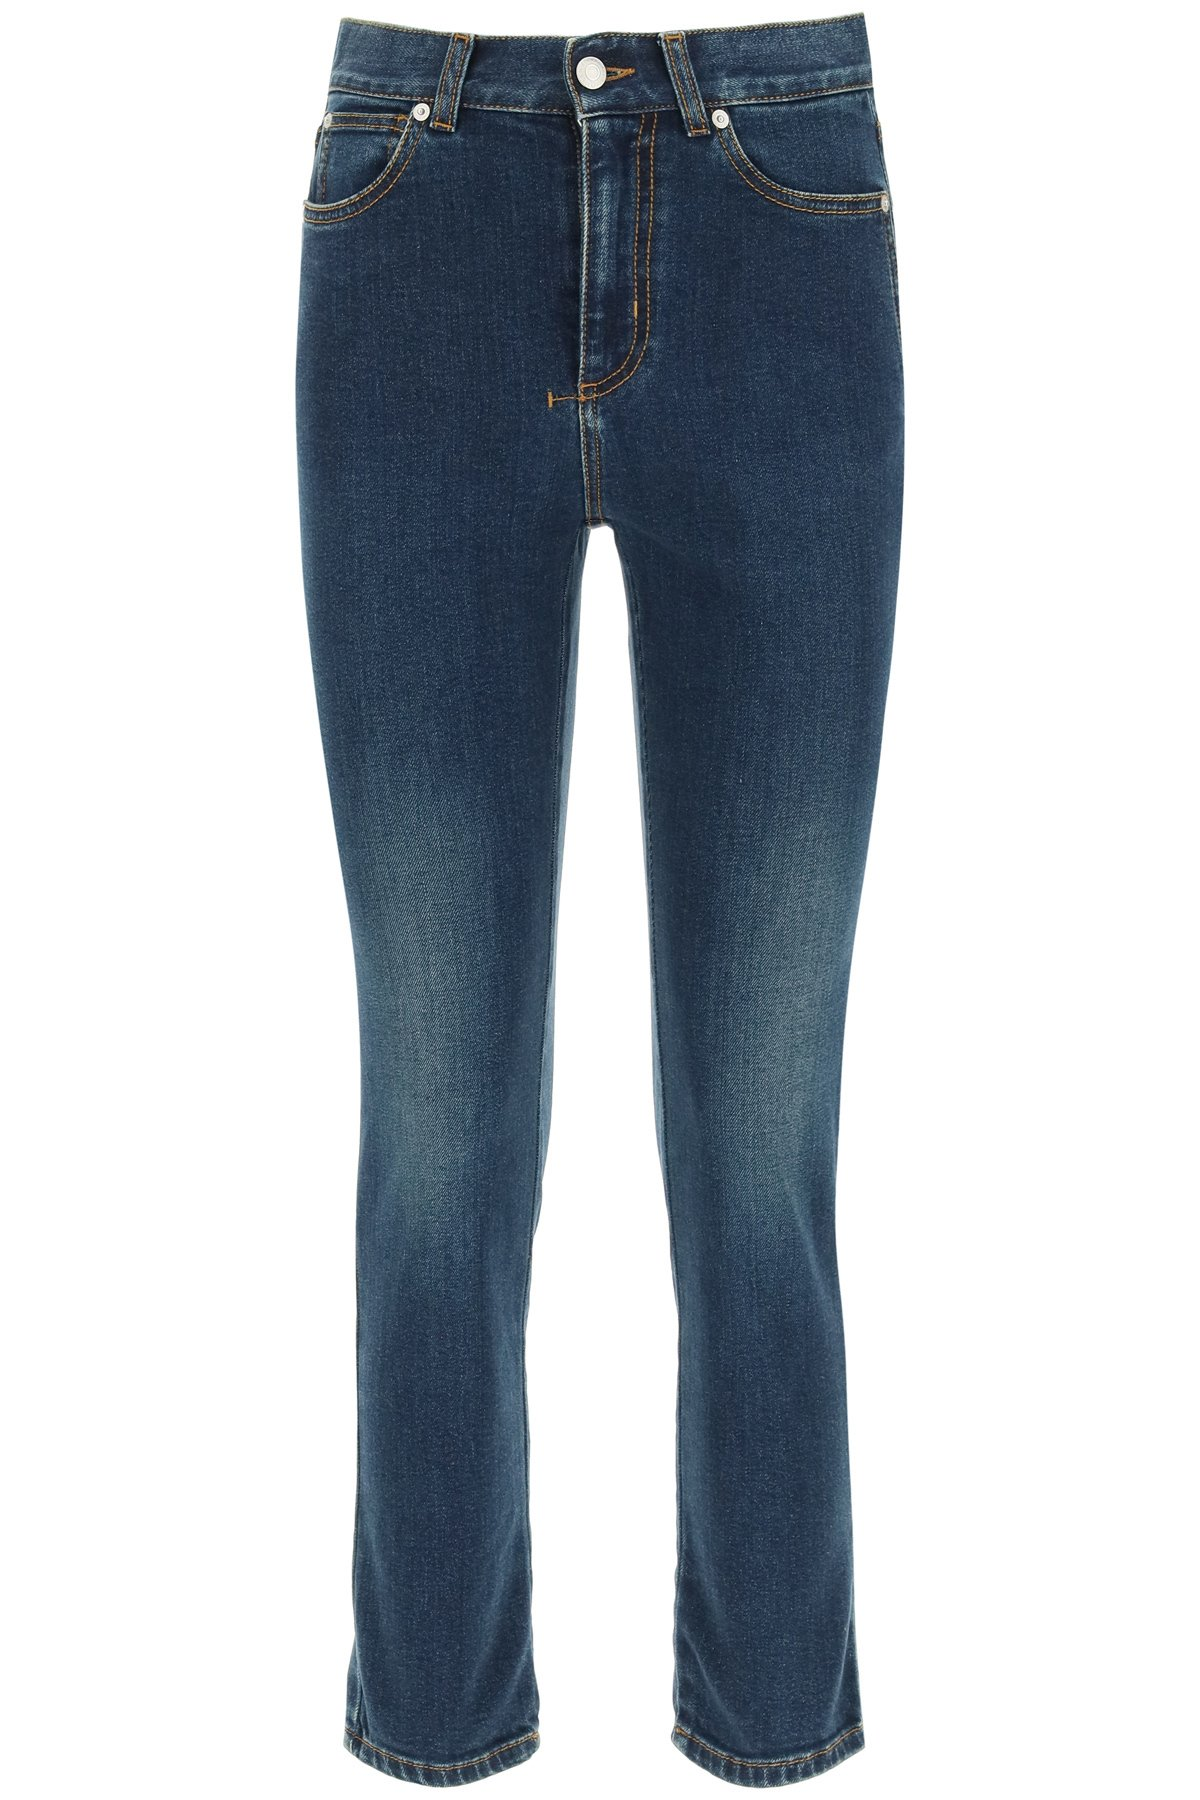 Alexander mcqueen jeans skinny cropped